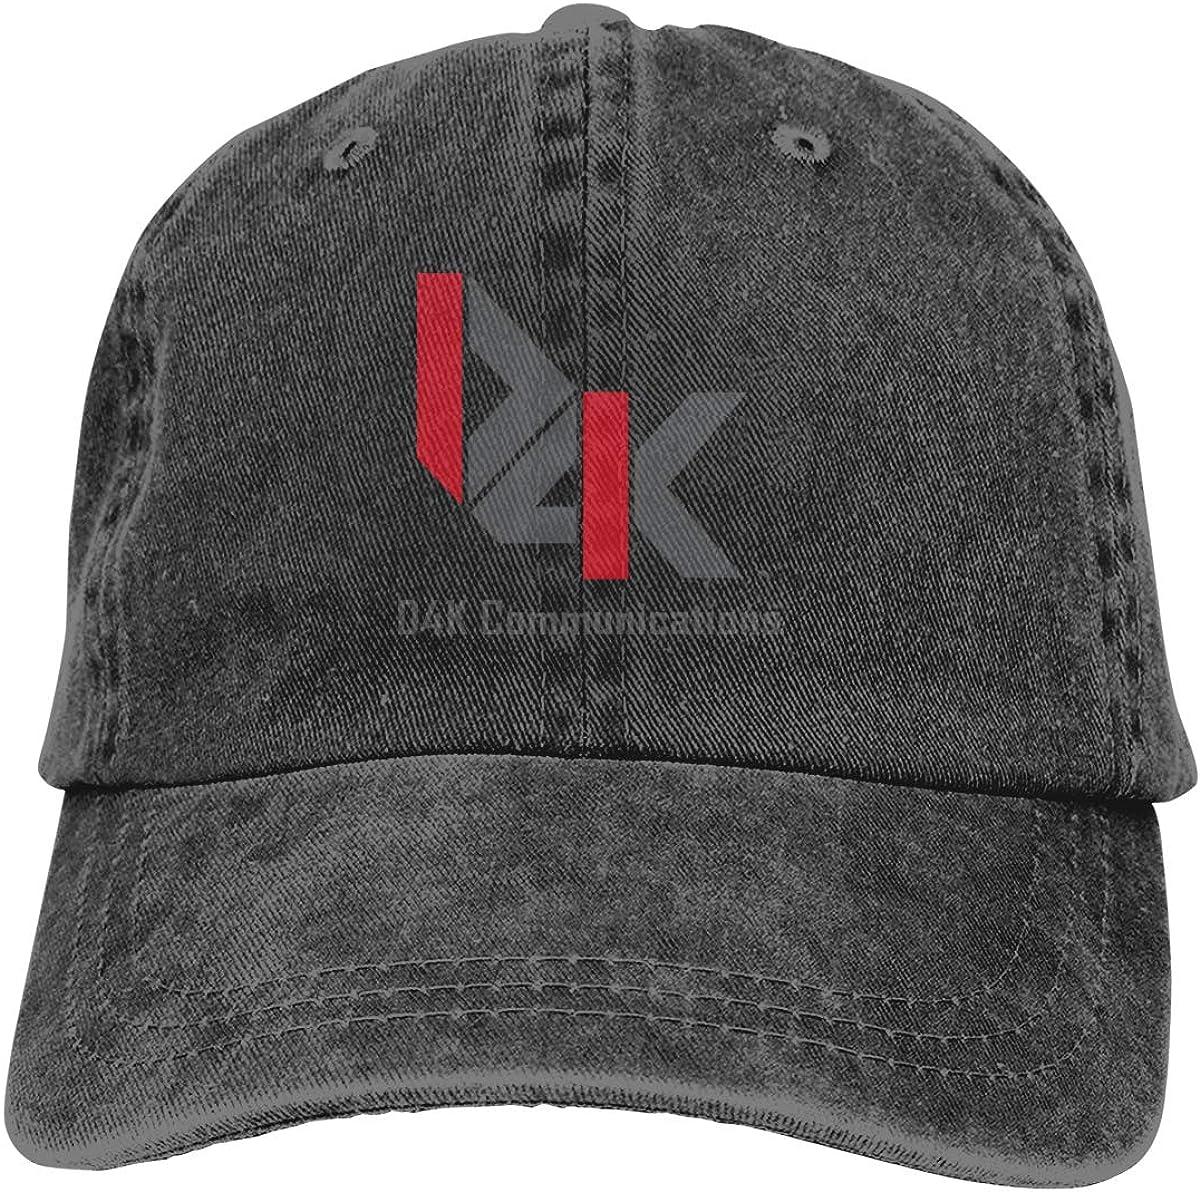 Haggai Romeo Unisex Football Dak-Prescott Snapback Baseball Cap Flat Brim Hip Hop Hat Adjustable Dad Hat